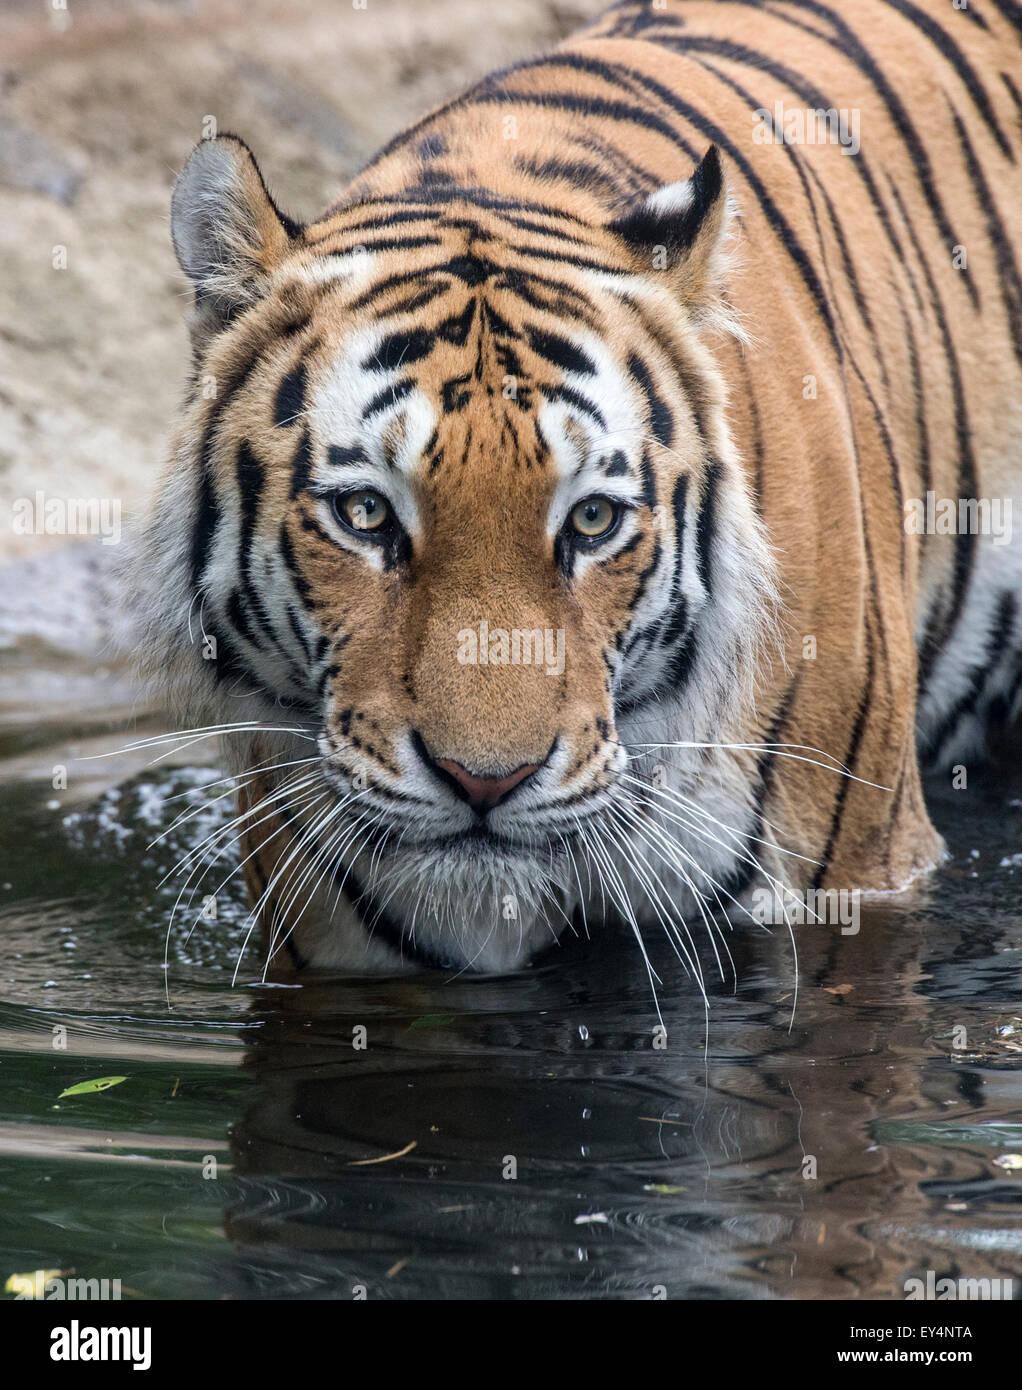 Male Amur (Siberian) tiger in pool - Stock Image